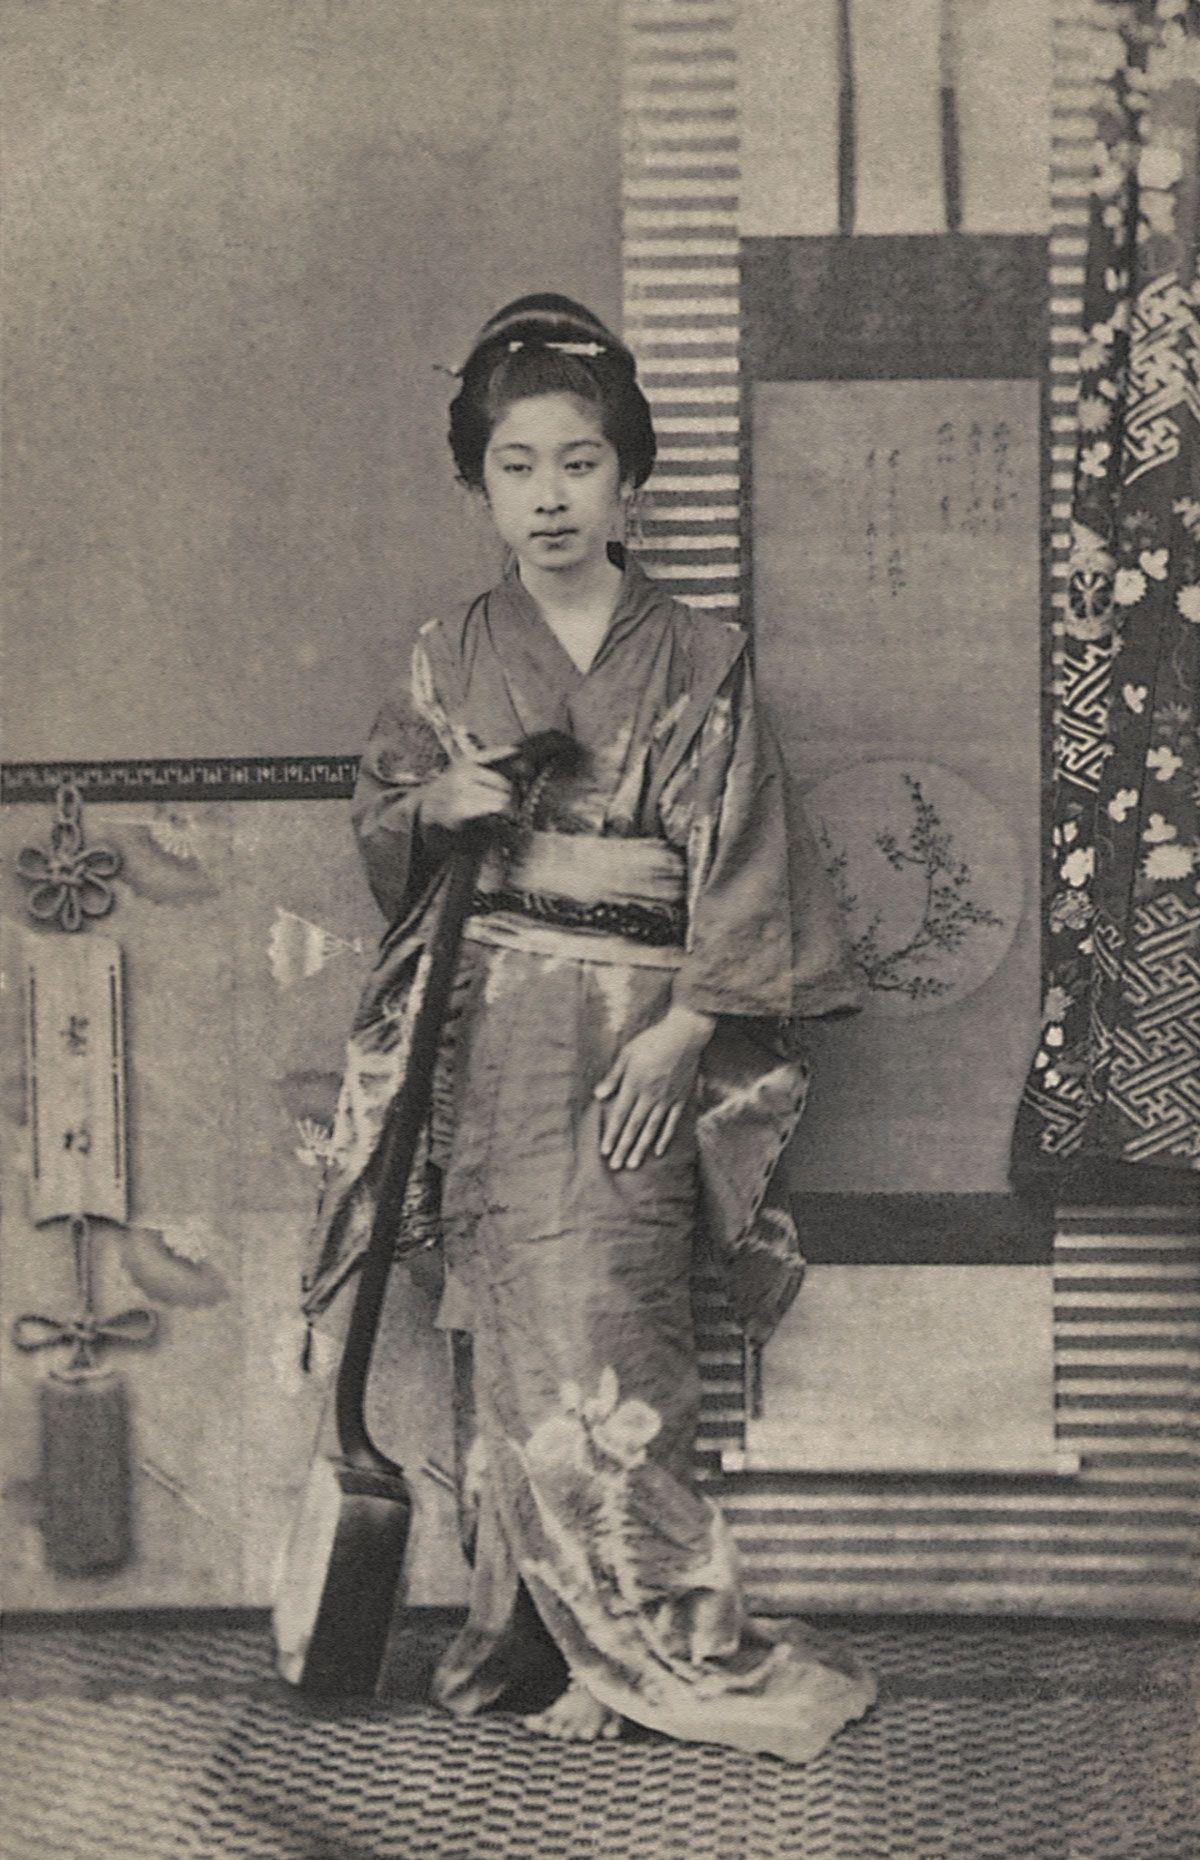 shimooka reno biography of william